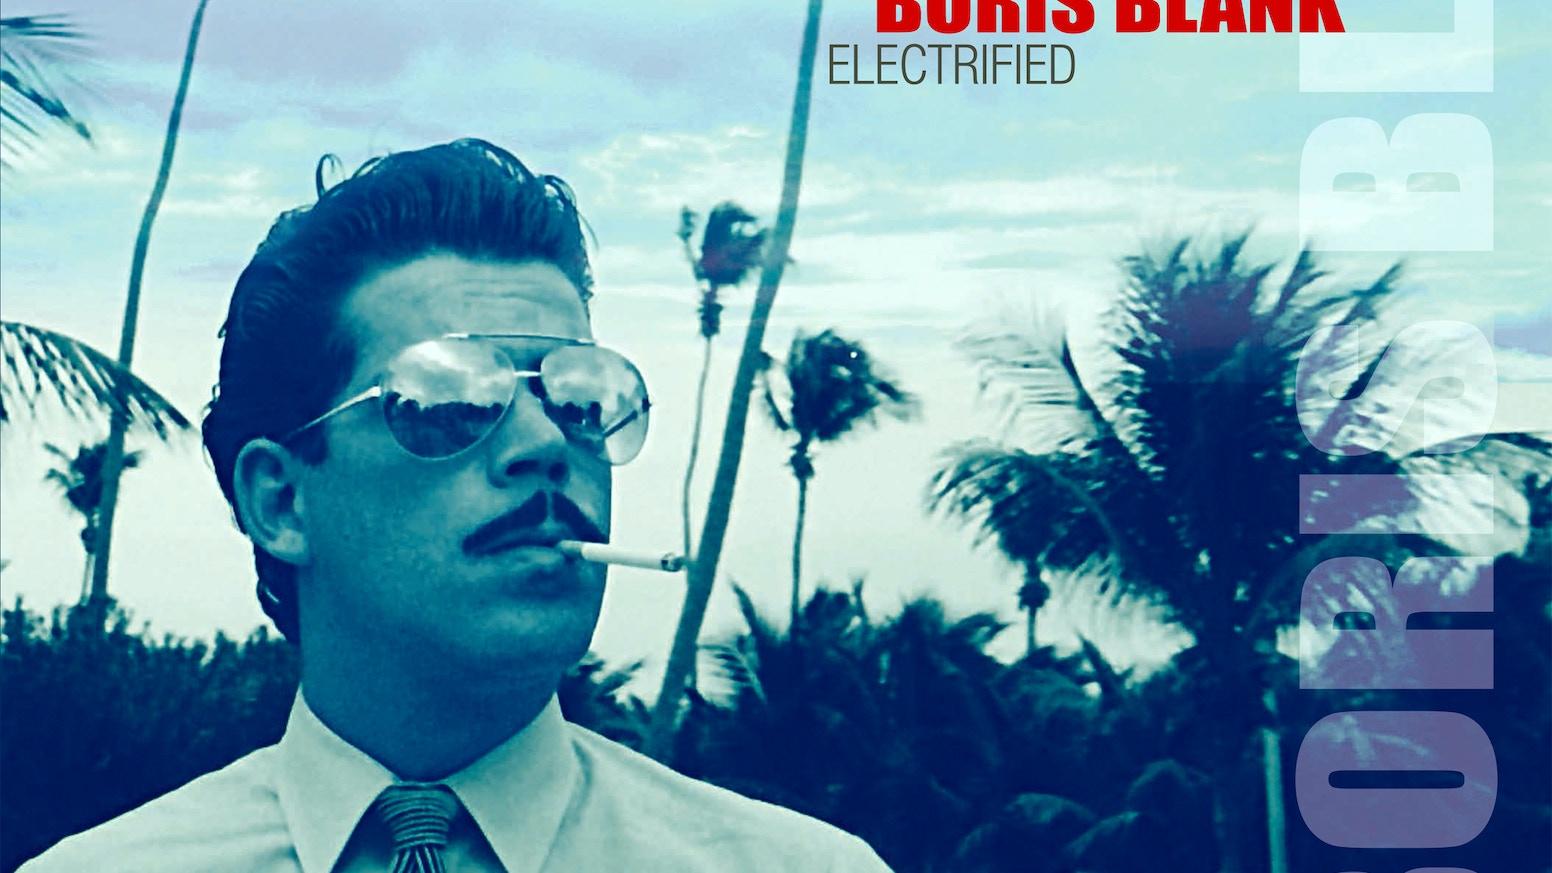 Boris Blank  Electrified  by Ian Tregoning — Kickstarter da40d87ae6